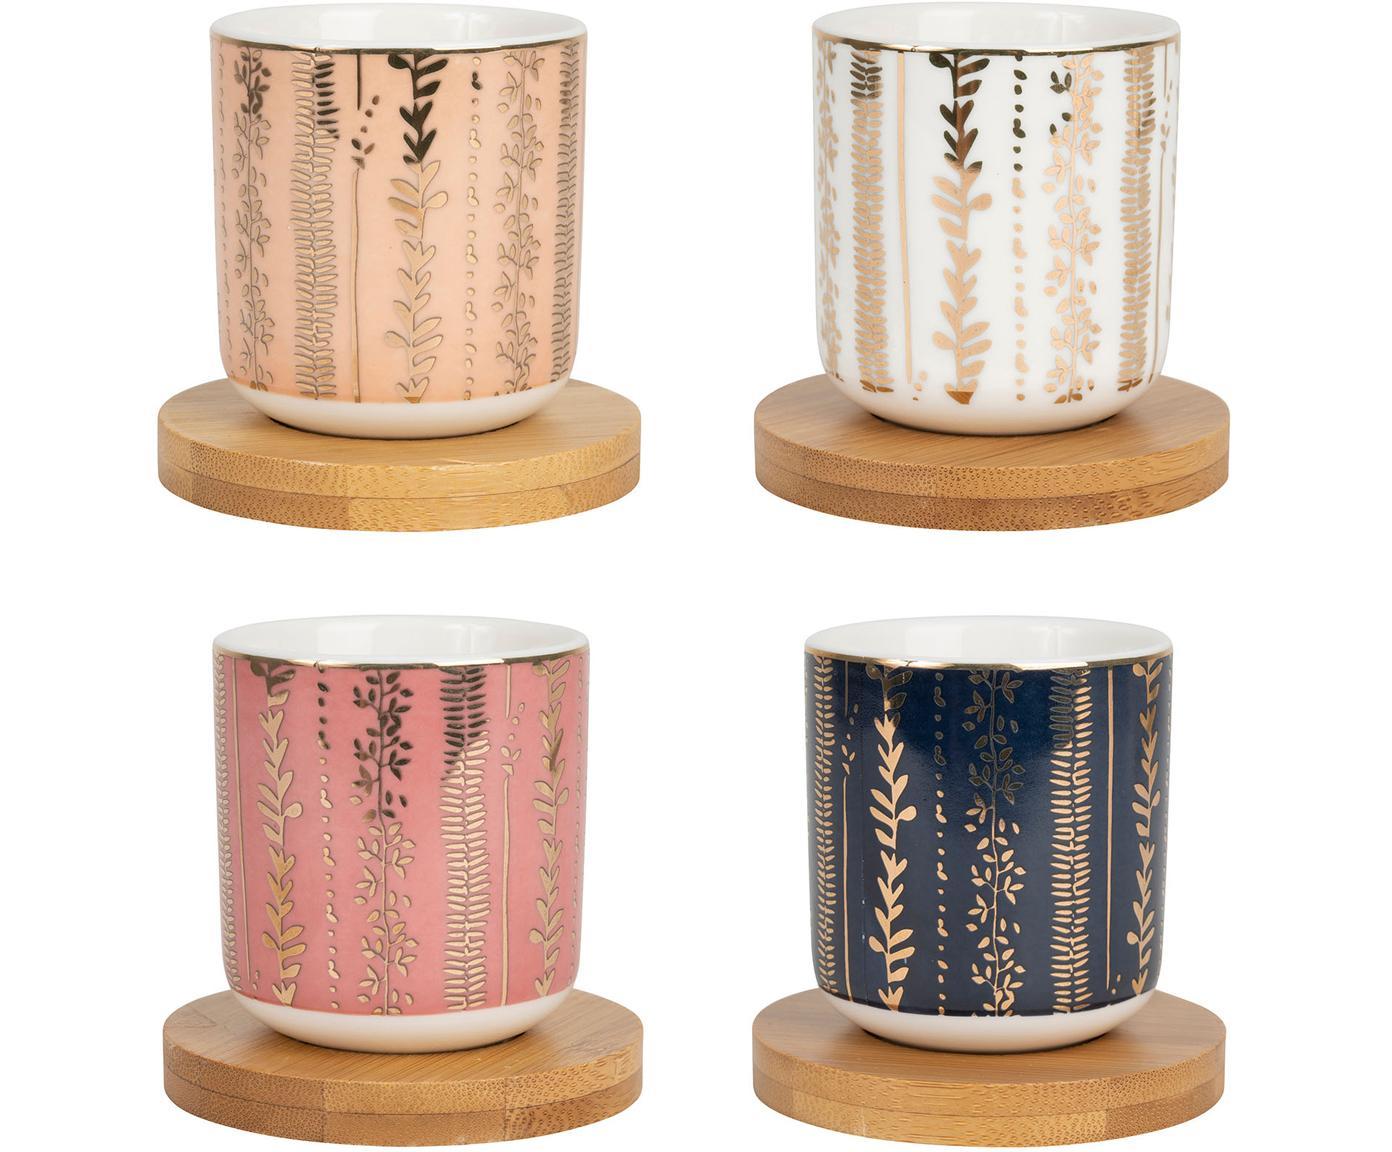 Espressokopjesset Veg-Gold met schoteltjes, 8-delig, Porselein, bamboehout, Roze, blauw, Ø 6 cm